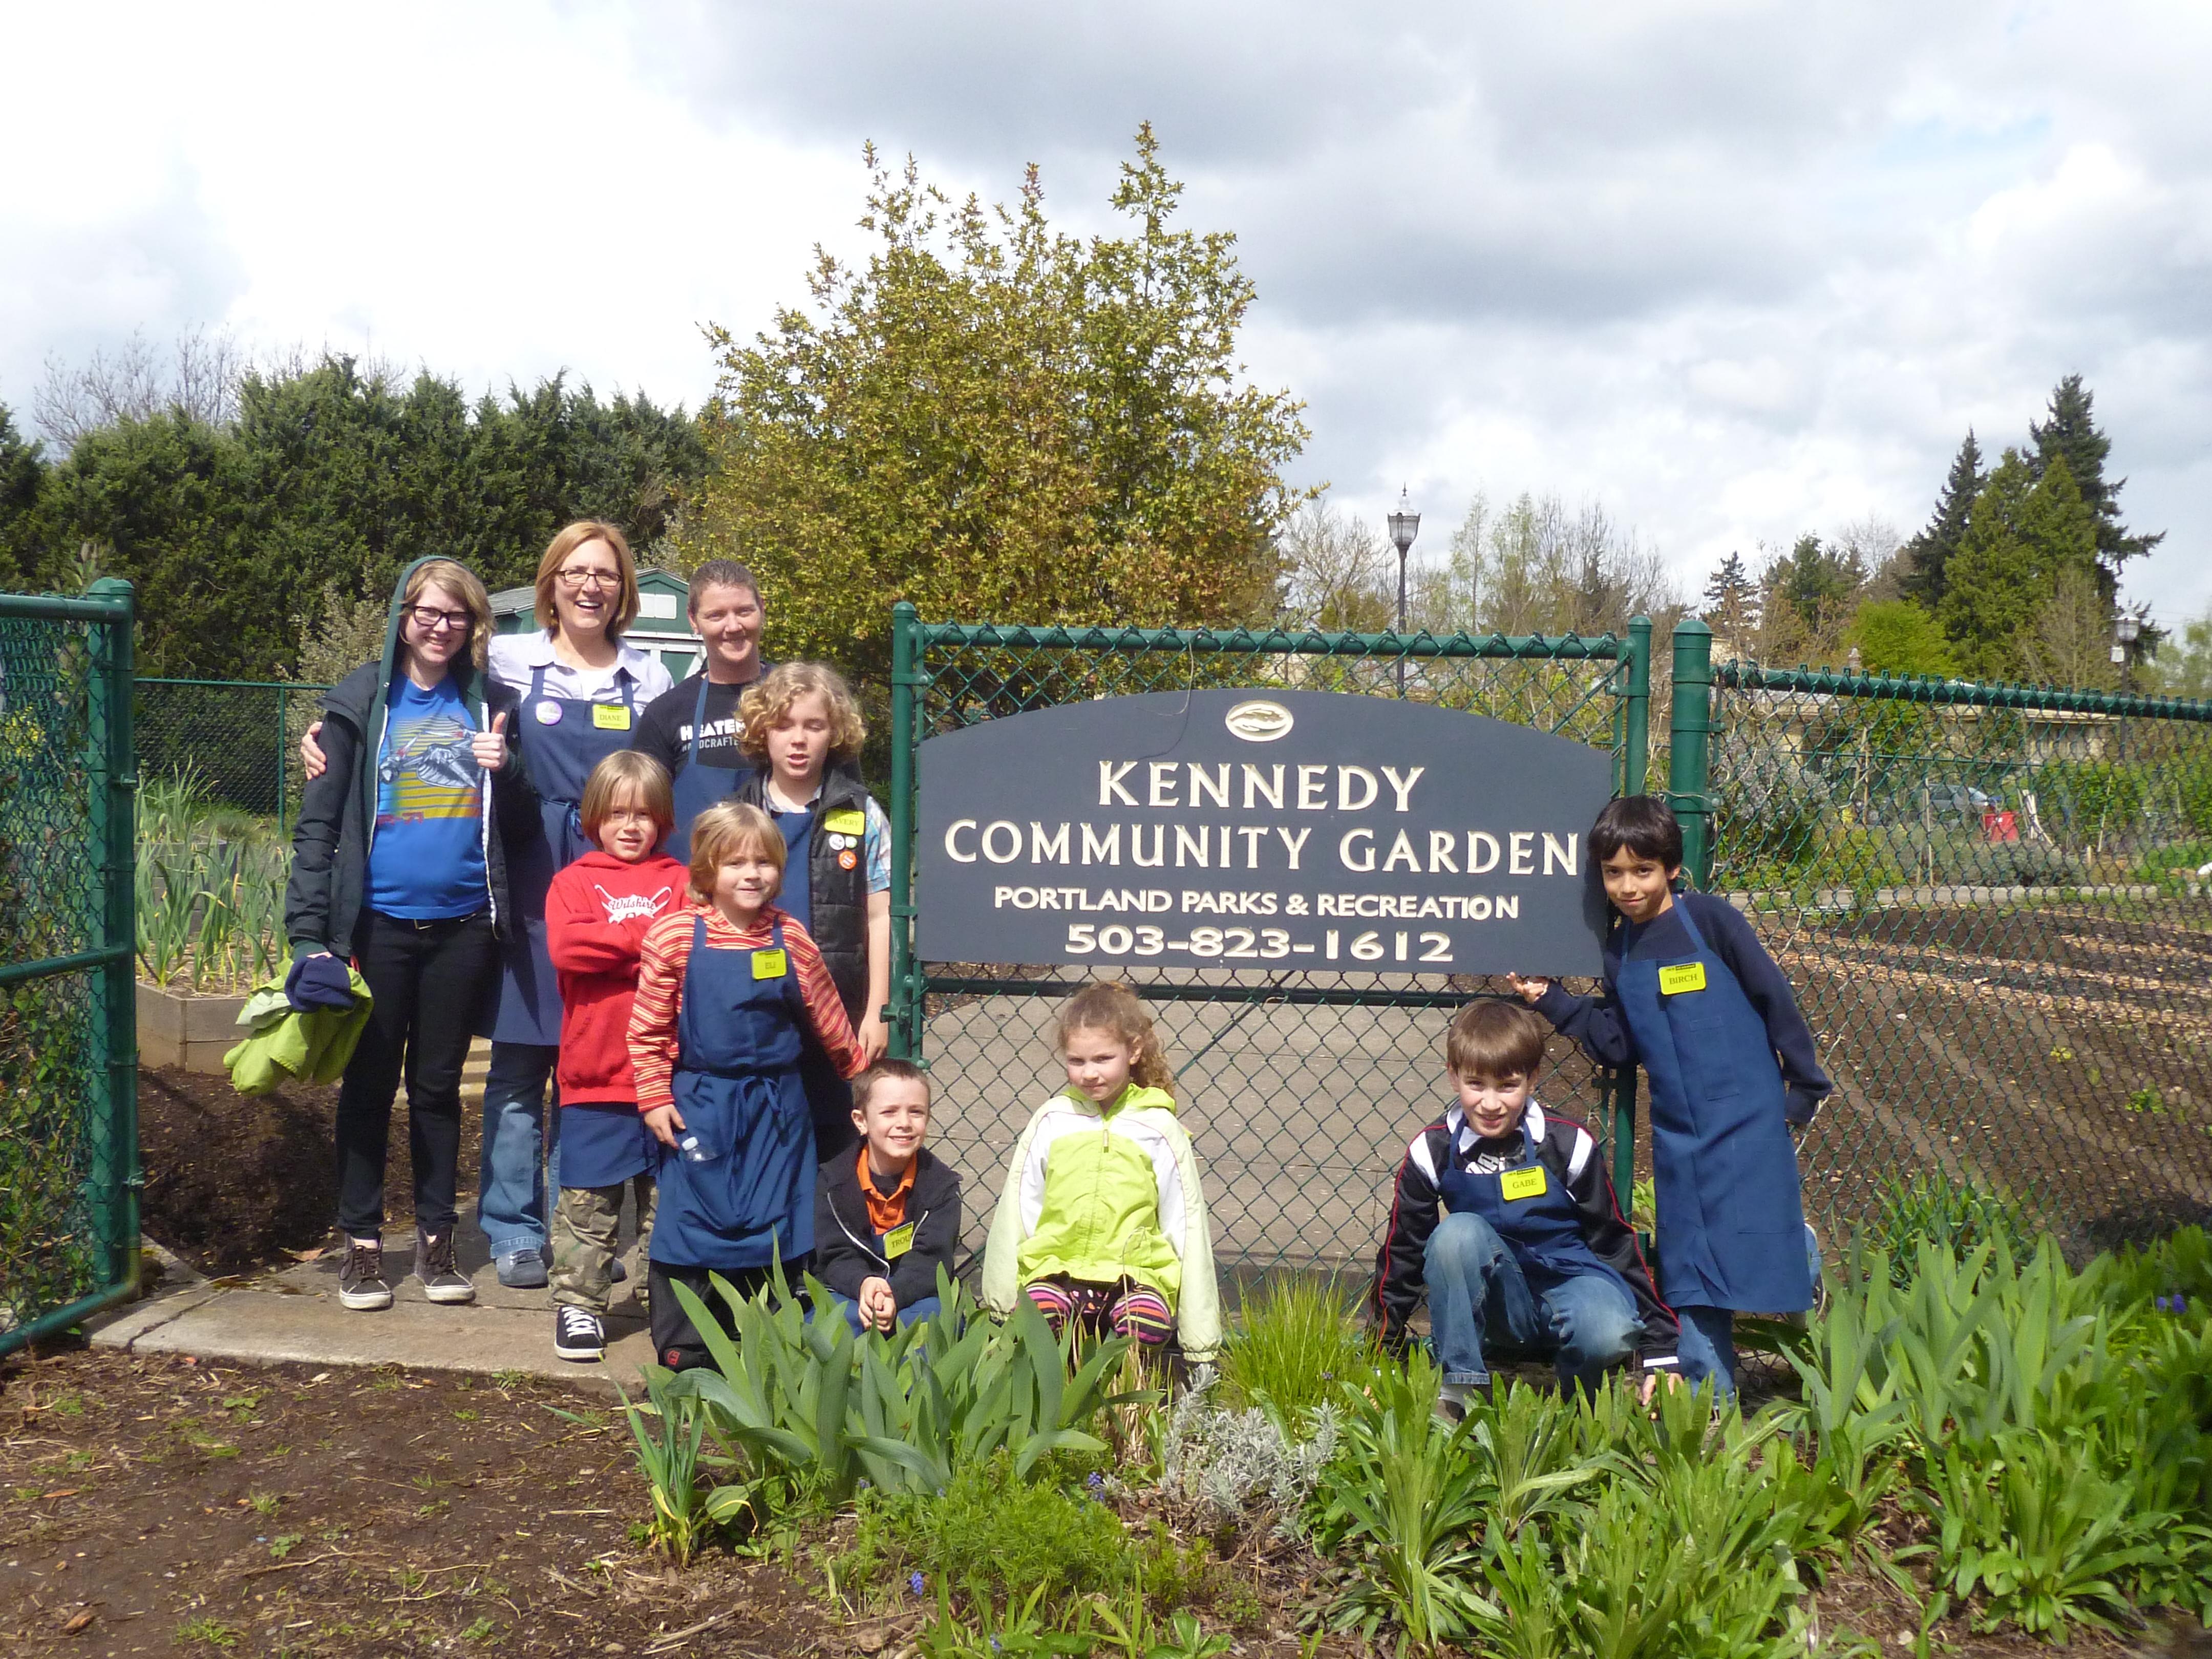 Kennedy Community Garden part of feature article about Autumn Garden Chores